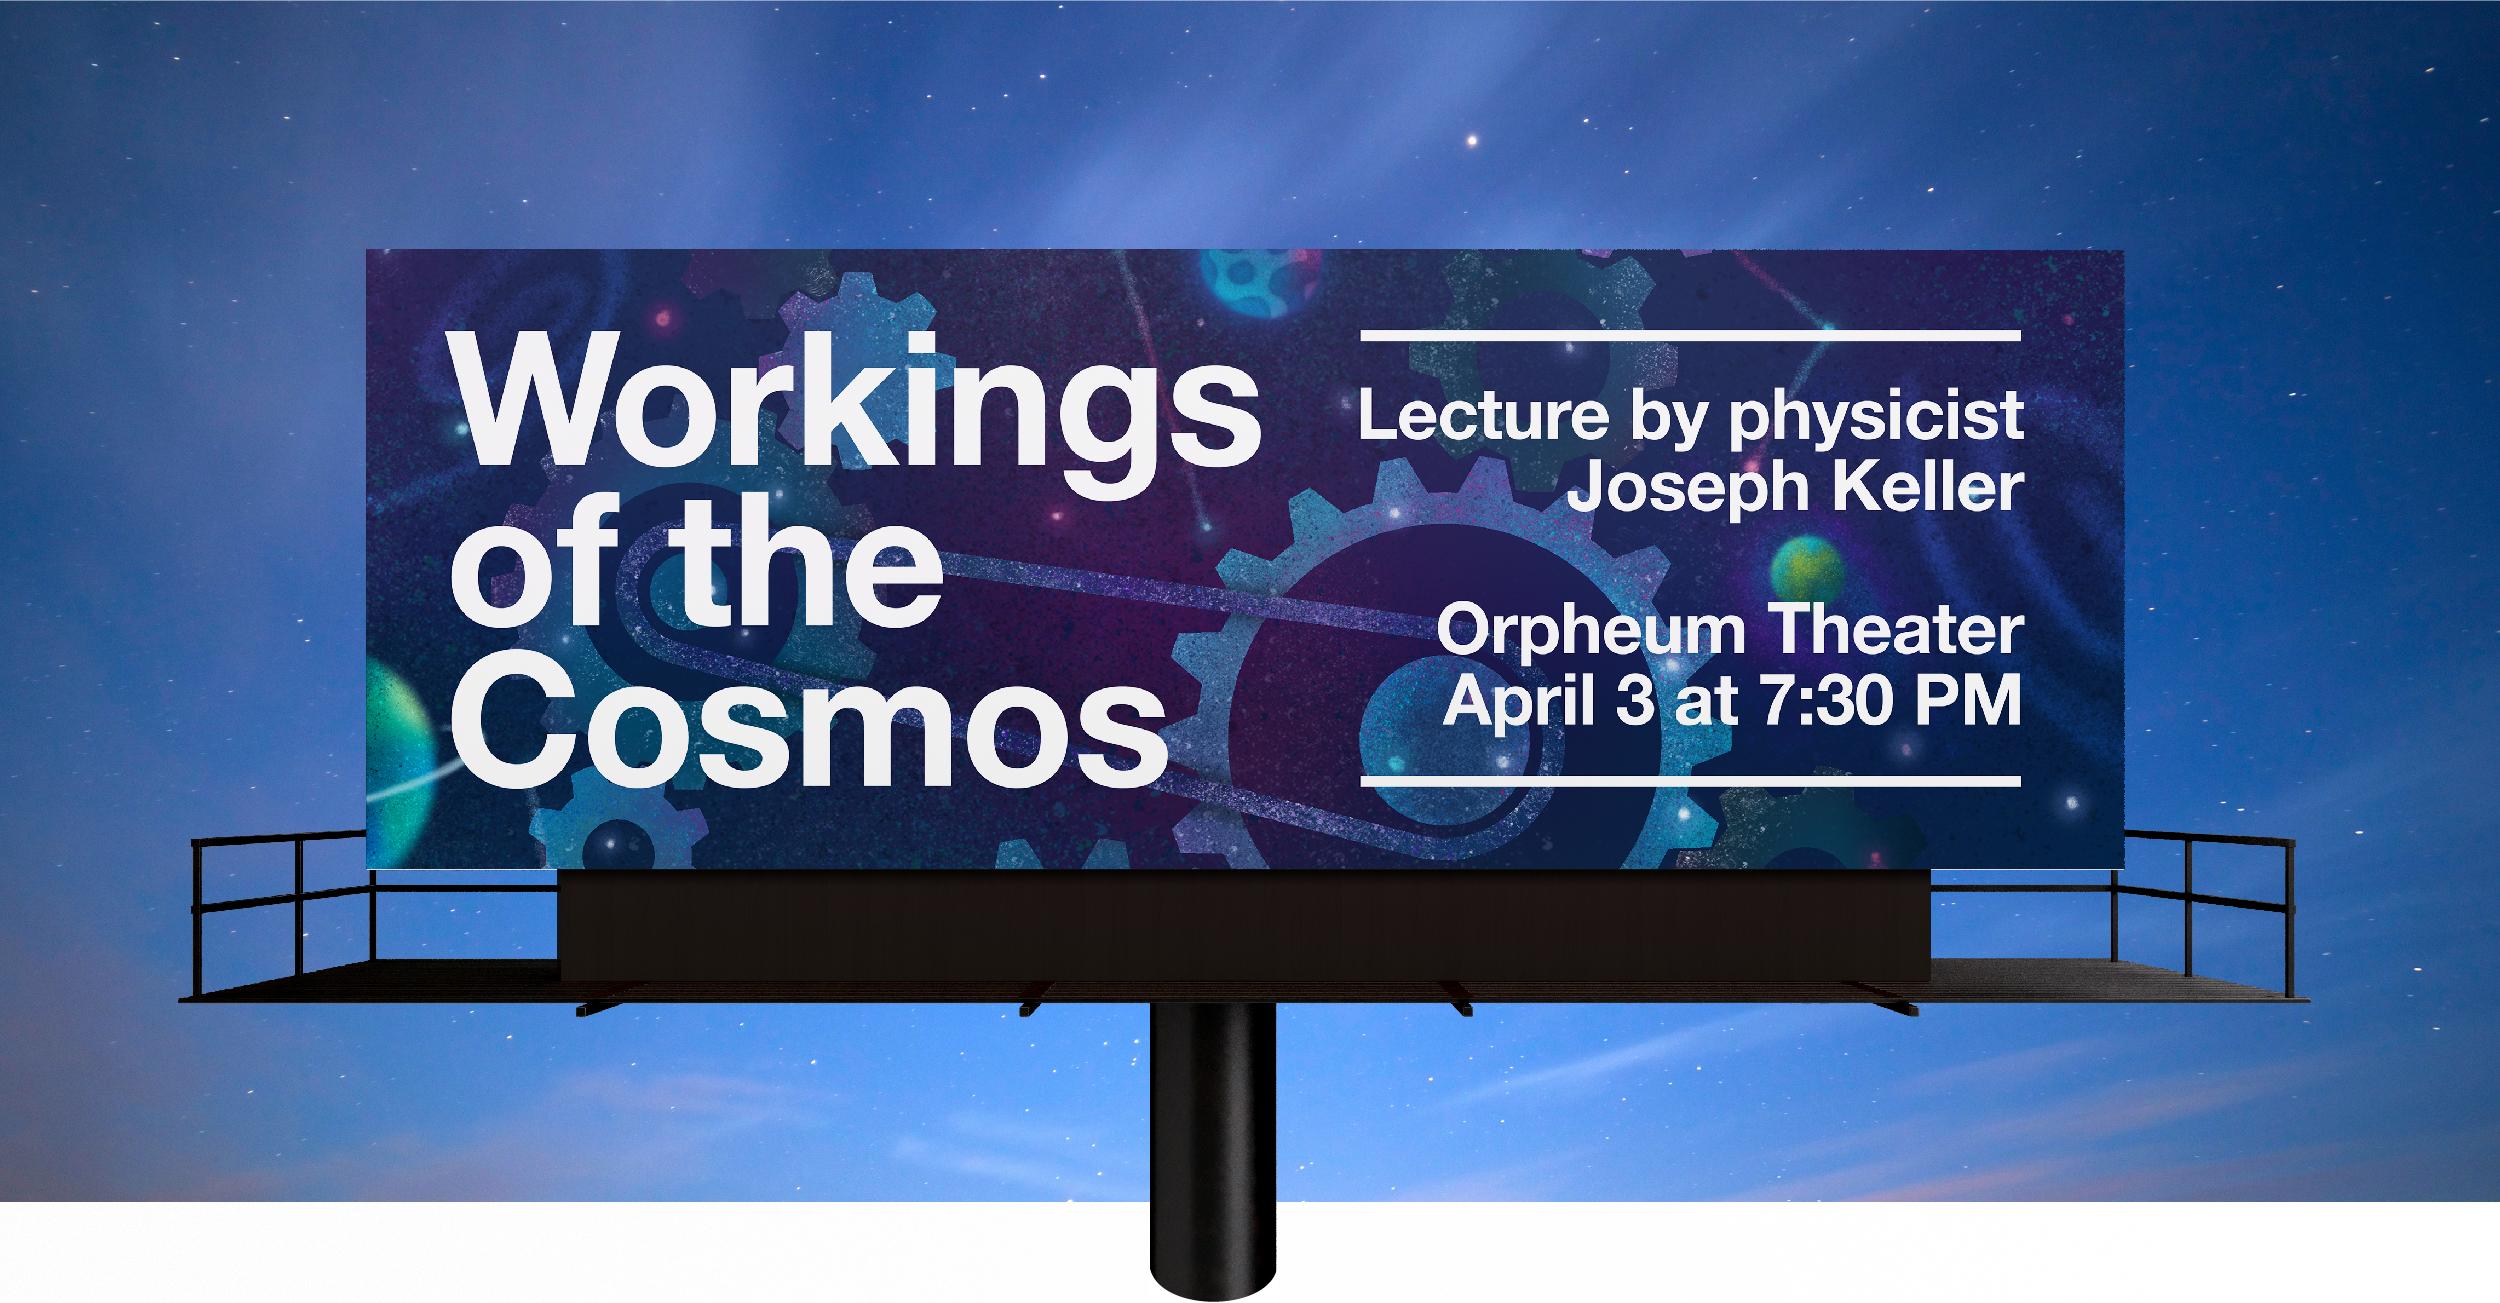 cosmos-billboard-image.jpg